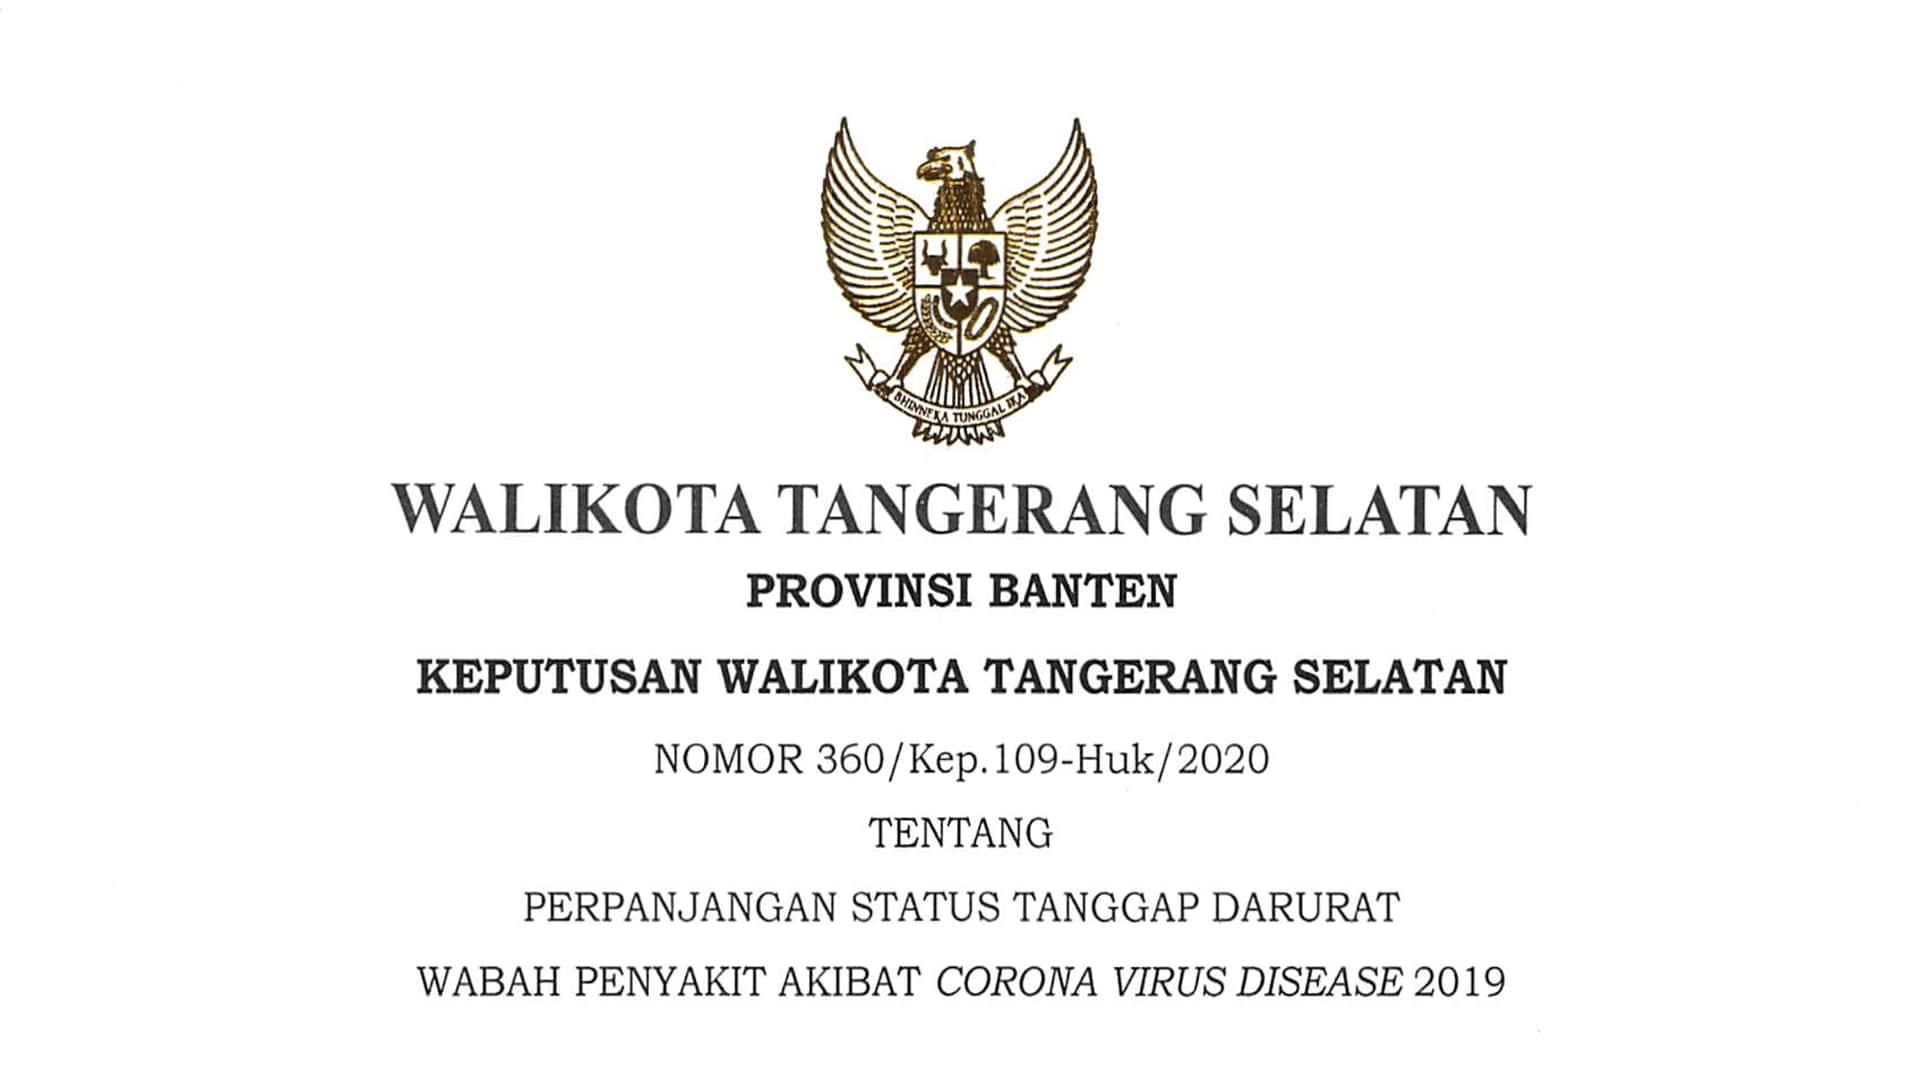 Keputusan Walikota Tangerang Selatan Nomor 360/Kep.190-Huk/2020